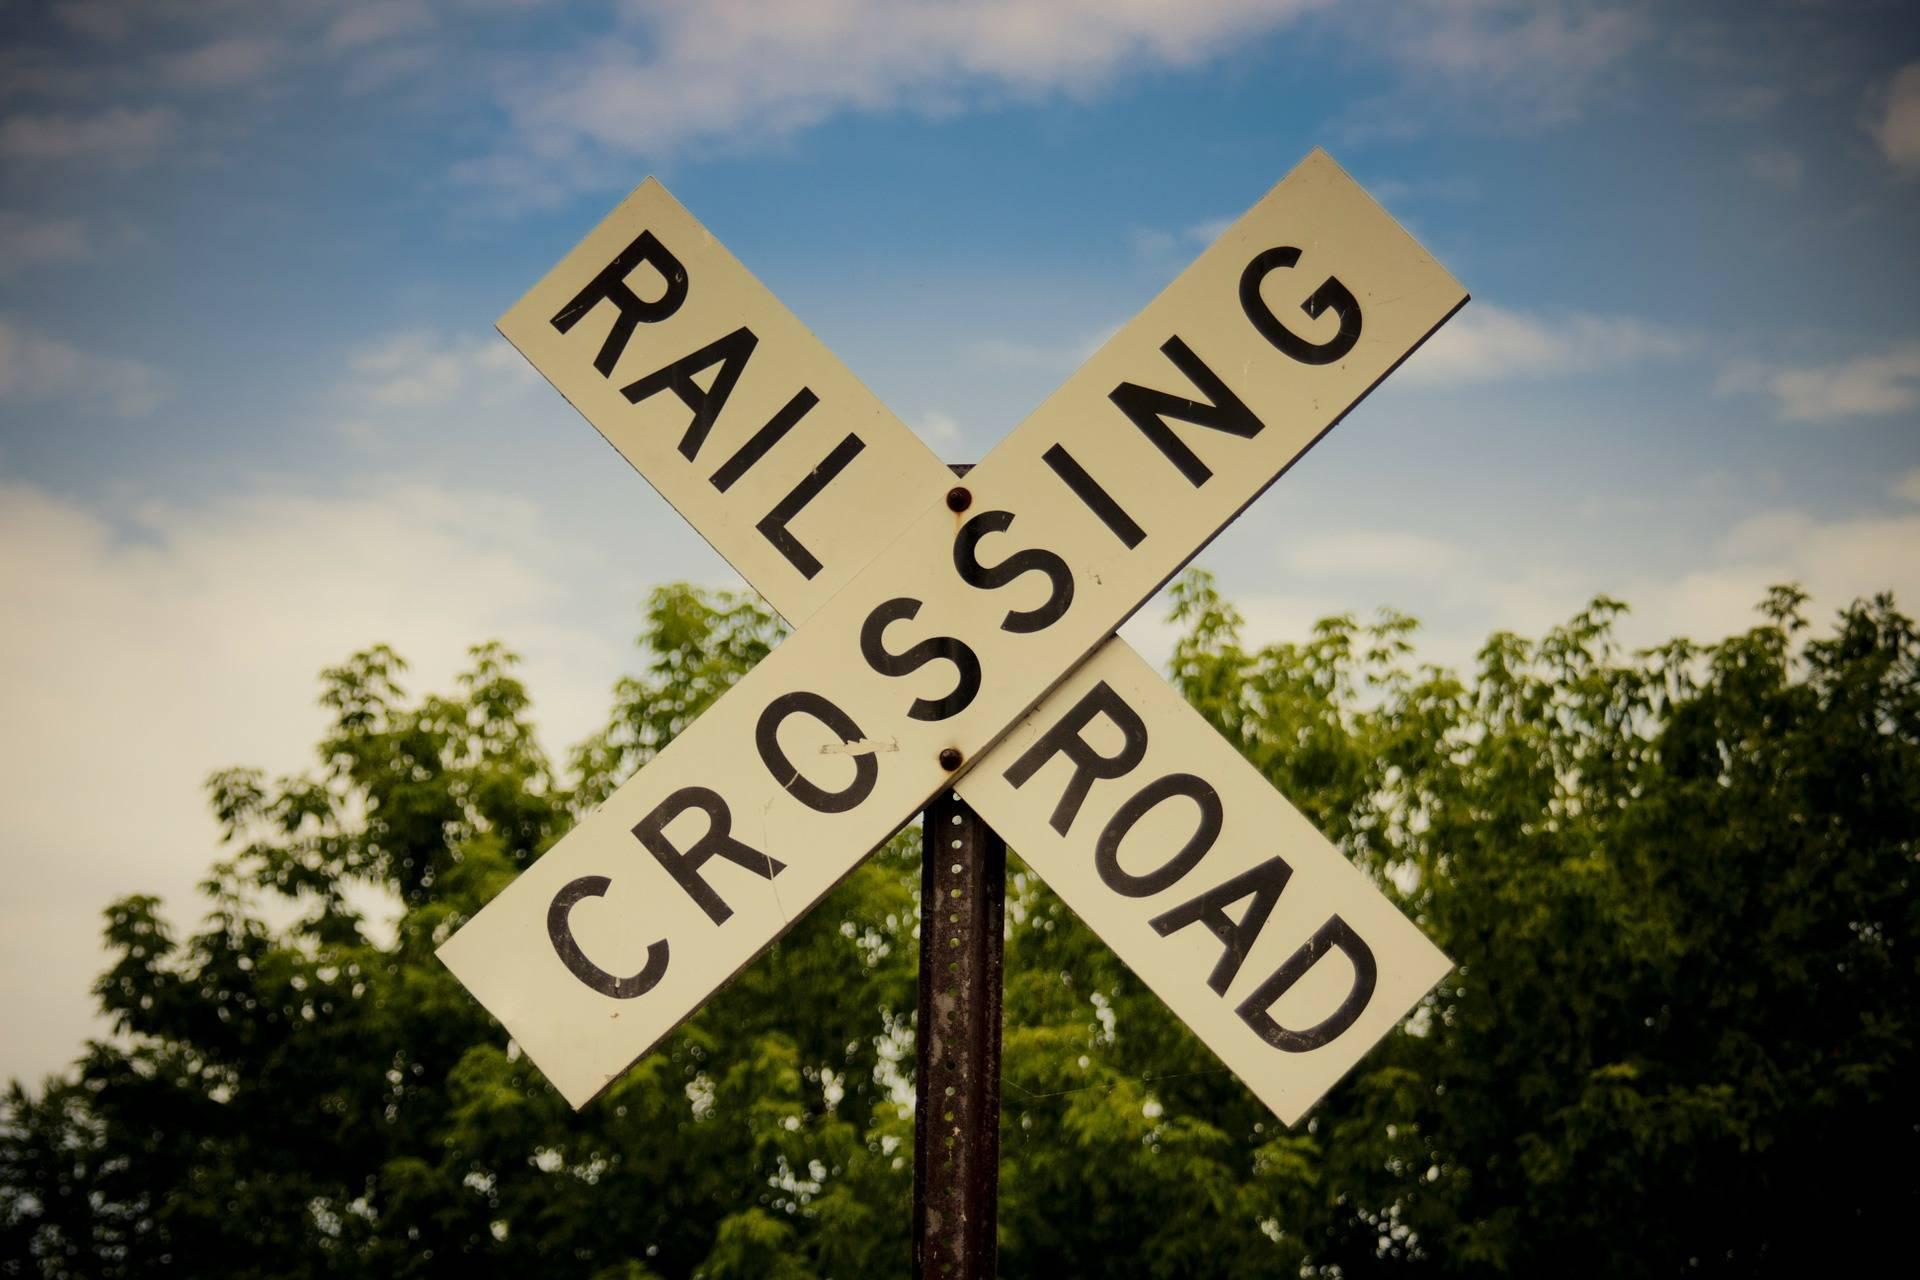 11cba7b28d65f7e38c12_railroad-crossing-176975_1920.jpg